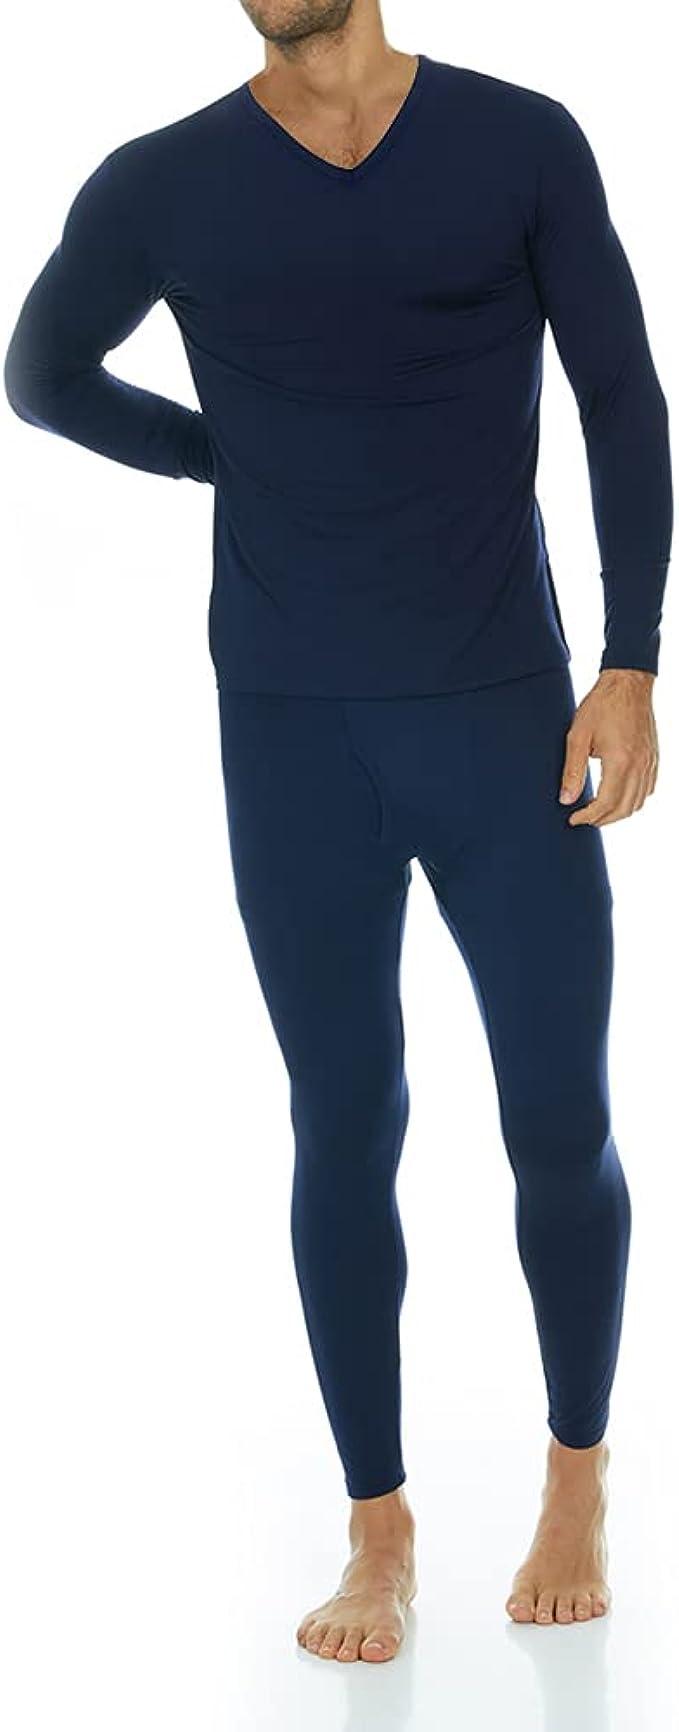 N002 Men/'s Ultra Soft winter inner wear Thermal underwear Long johns with double